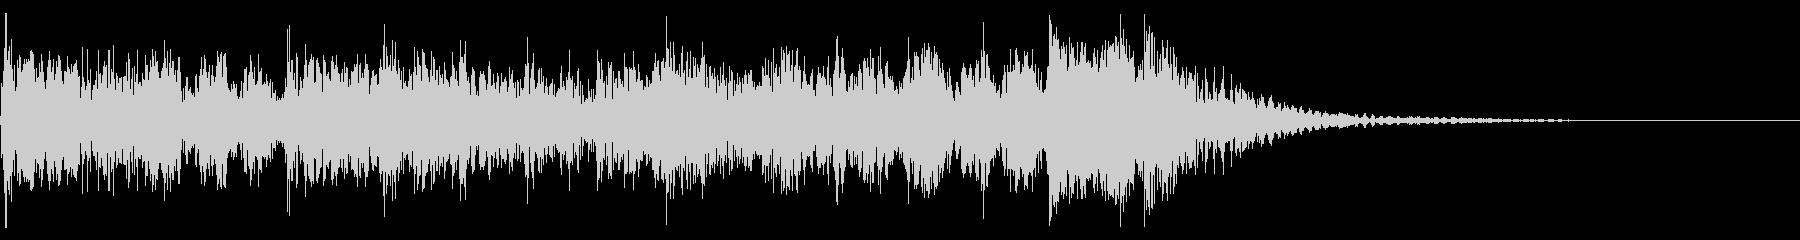 YouTube尺八による和風ジングル05の未再生の波形